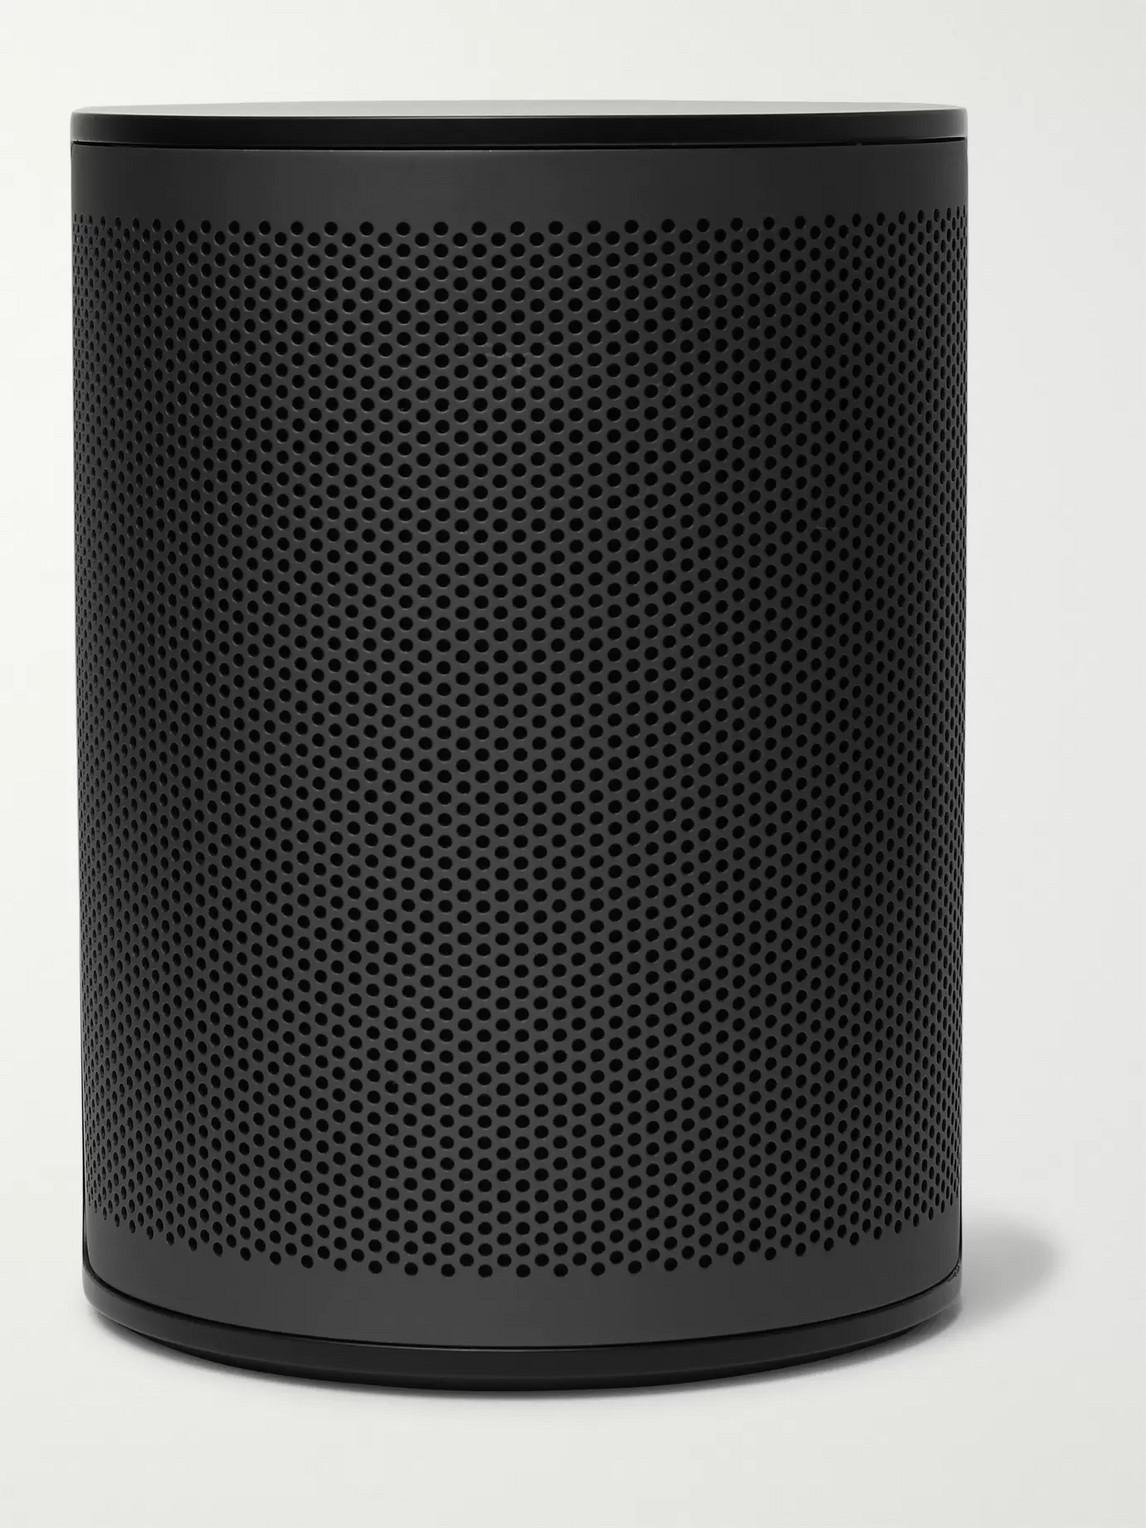 bang amp; olufsen - beoplay m3 wireless speaker - black - one size - men